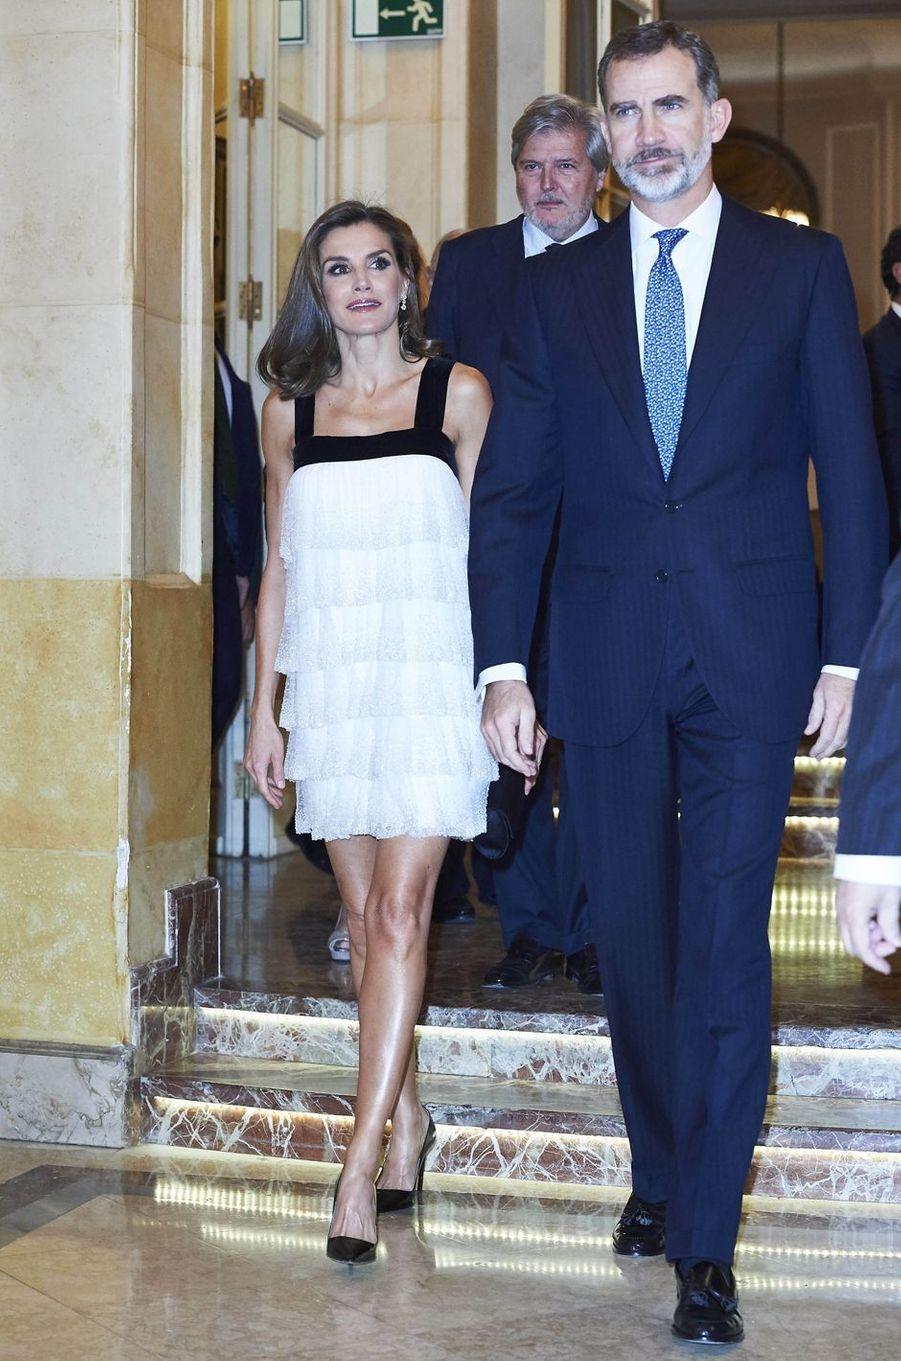 La reine Letizia, dans une mini-robe Charleston, et le roi Felipe VI d'Espagne à Madrid, le 22 novembre 2017